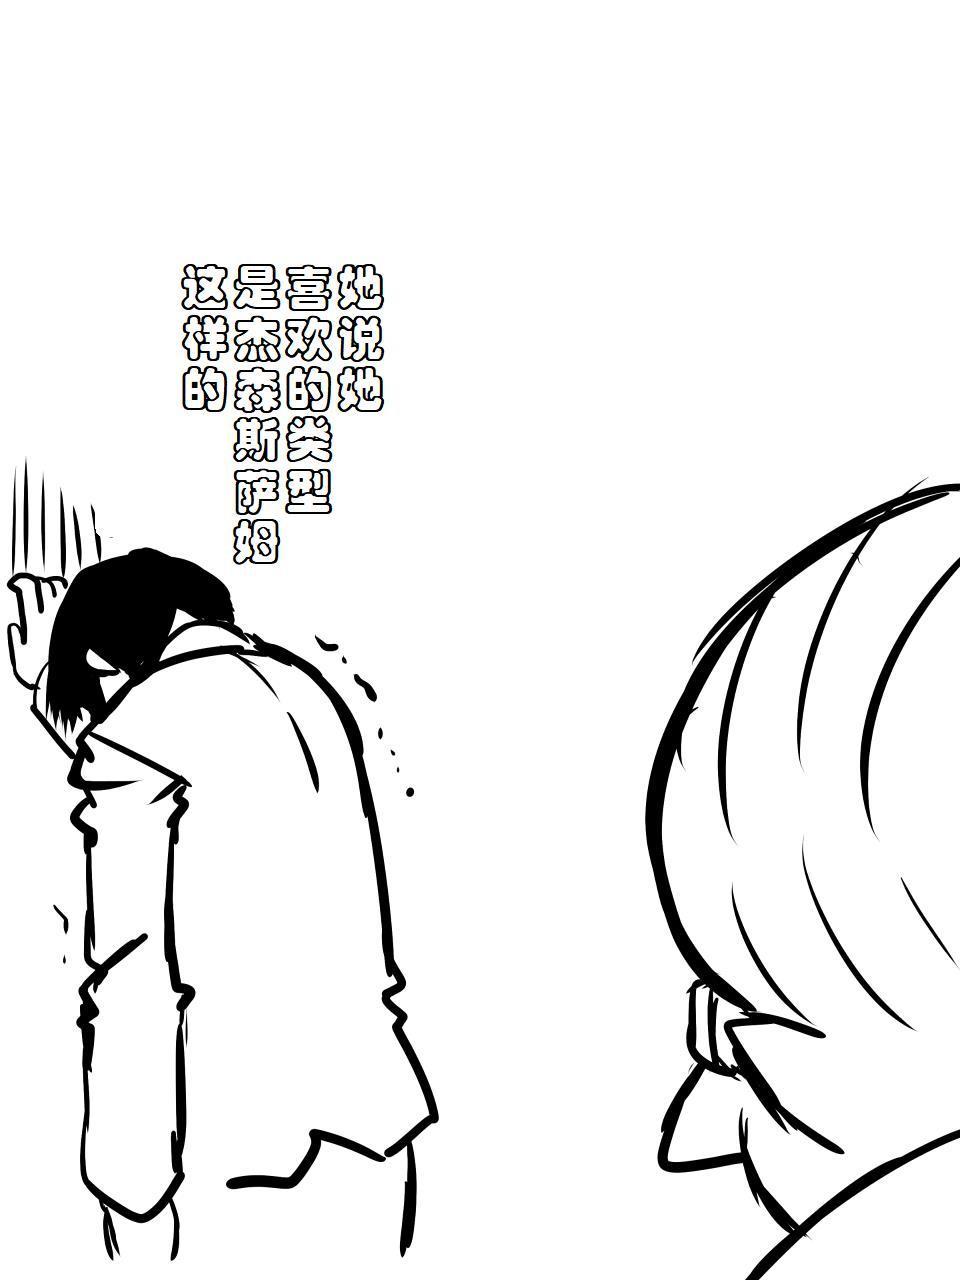 [Atelier Hachifukuan] Superheroine Yuukai Ryoujoku III - Superheroine in Distress [Chrome Rose Bell]   凌辱诱拐3 [Chinese] [有条色狼汉化] 34